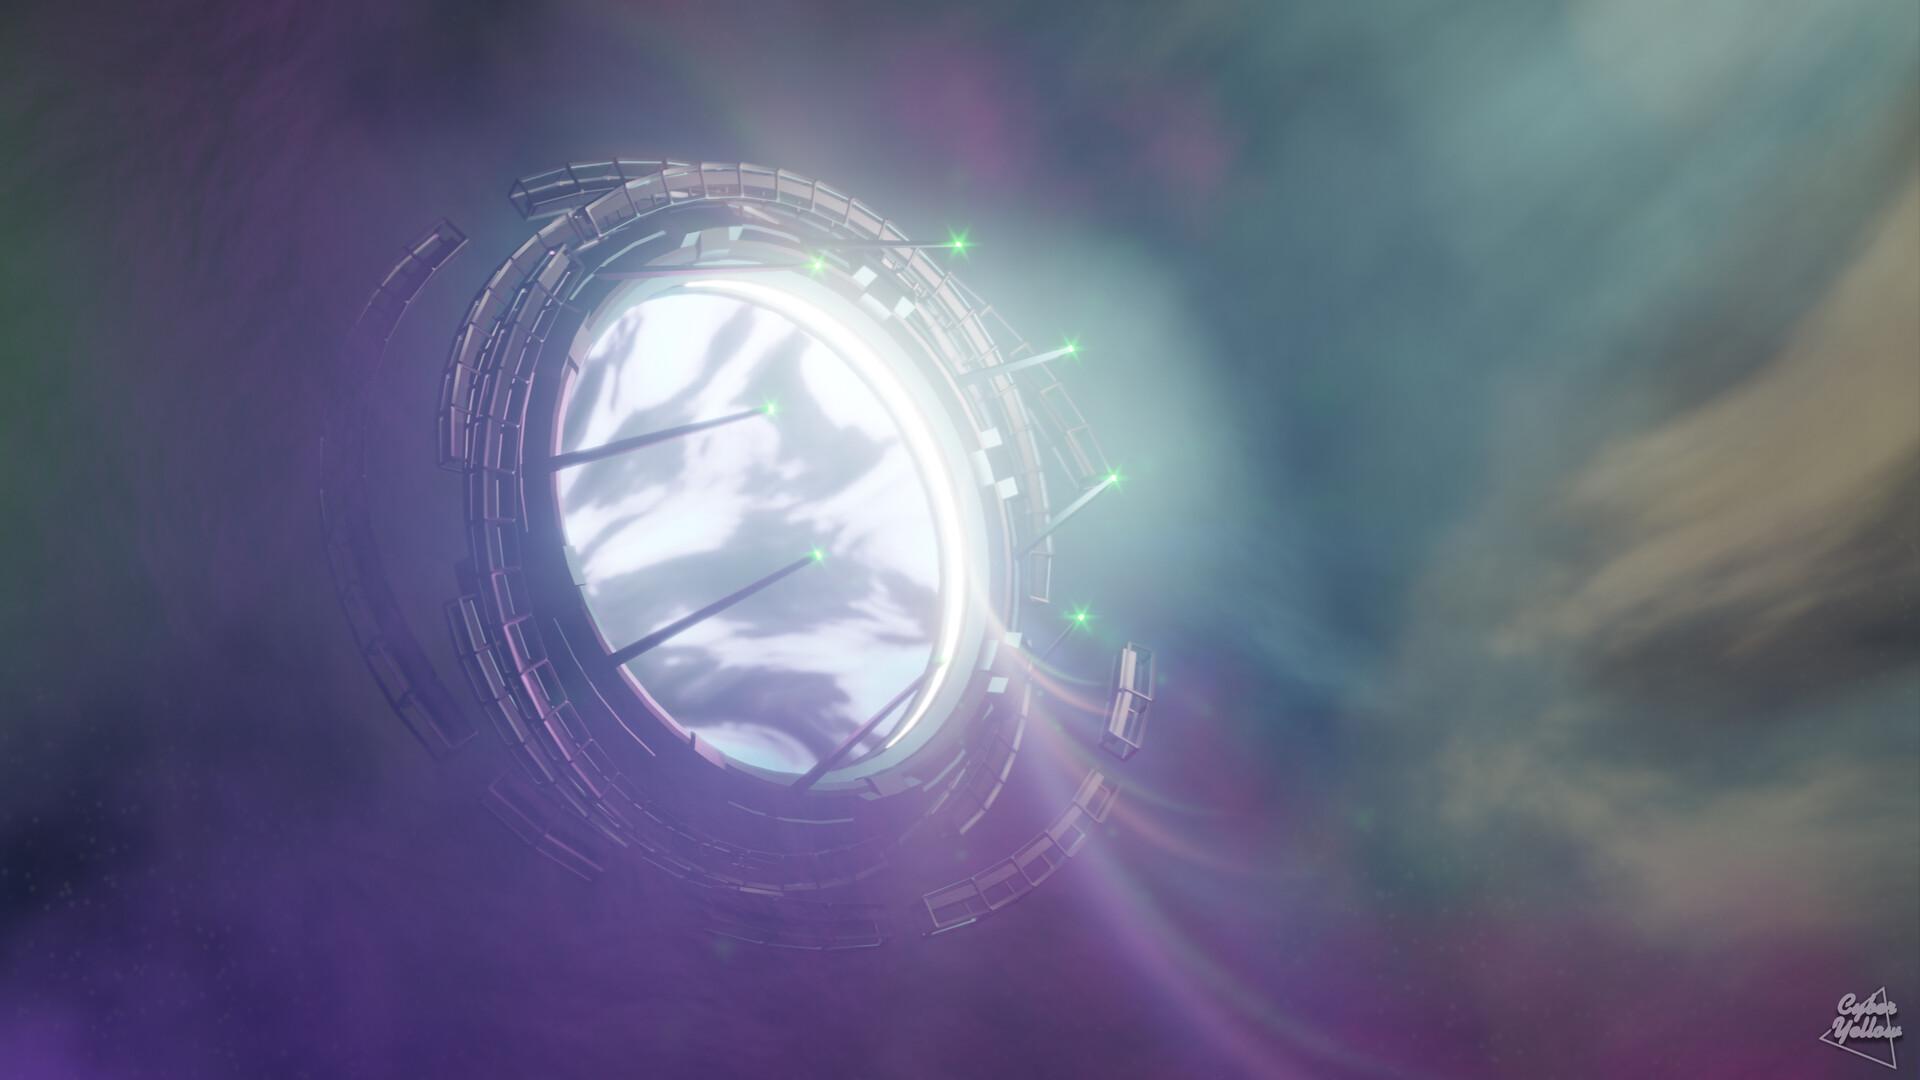 C Y B E R Y E L L O W Wormhole Space Portal Wallpaper 1440p